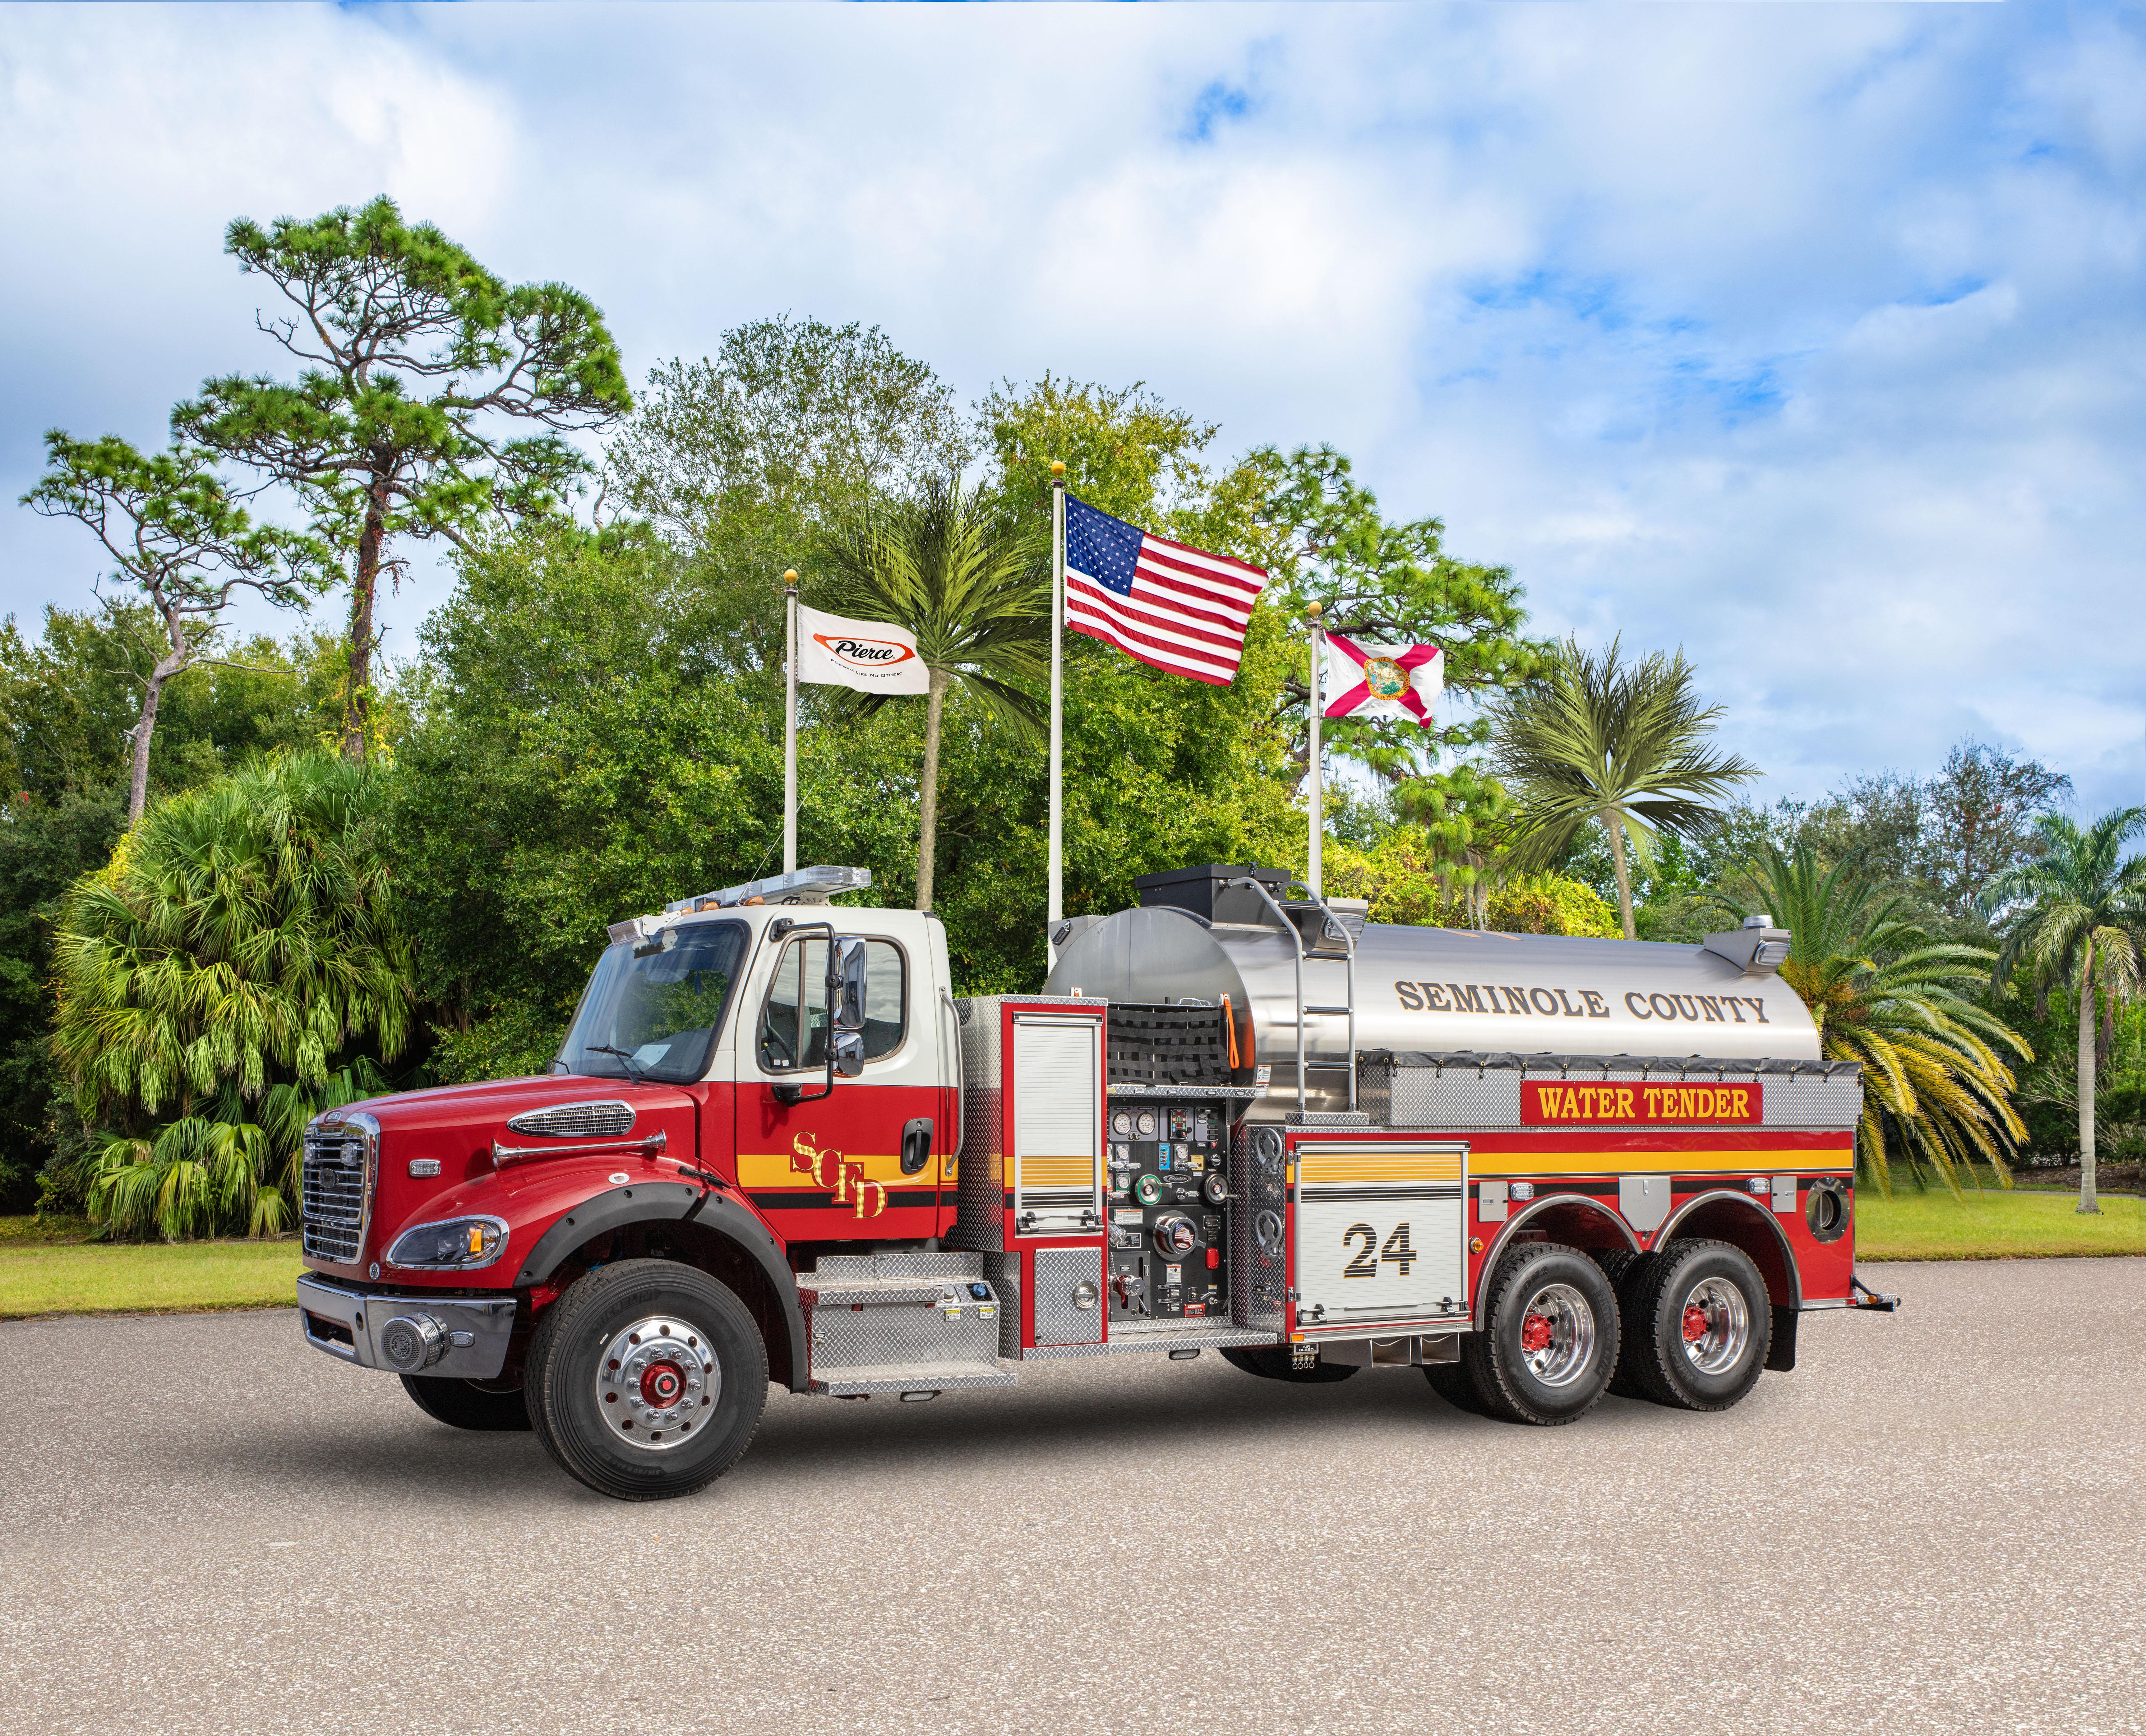 Seminole County Fire Department - Tanker